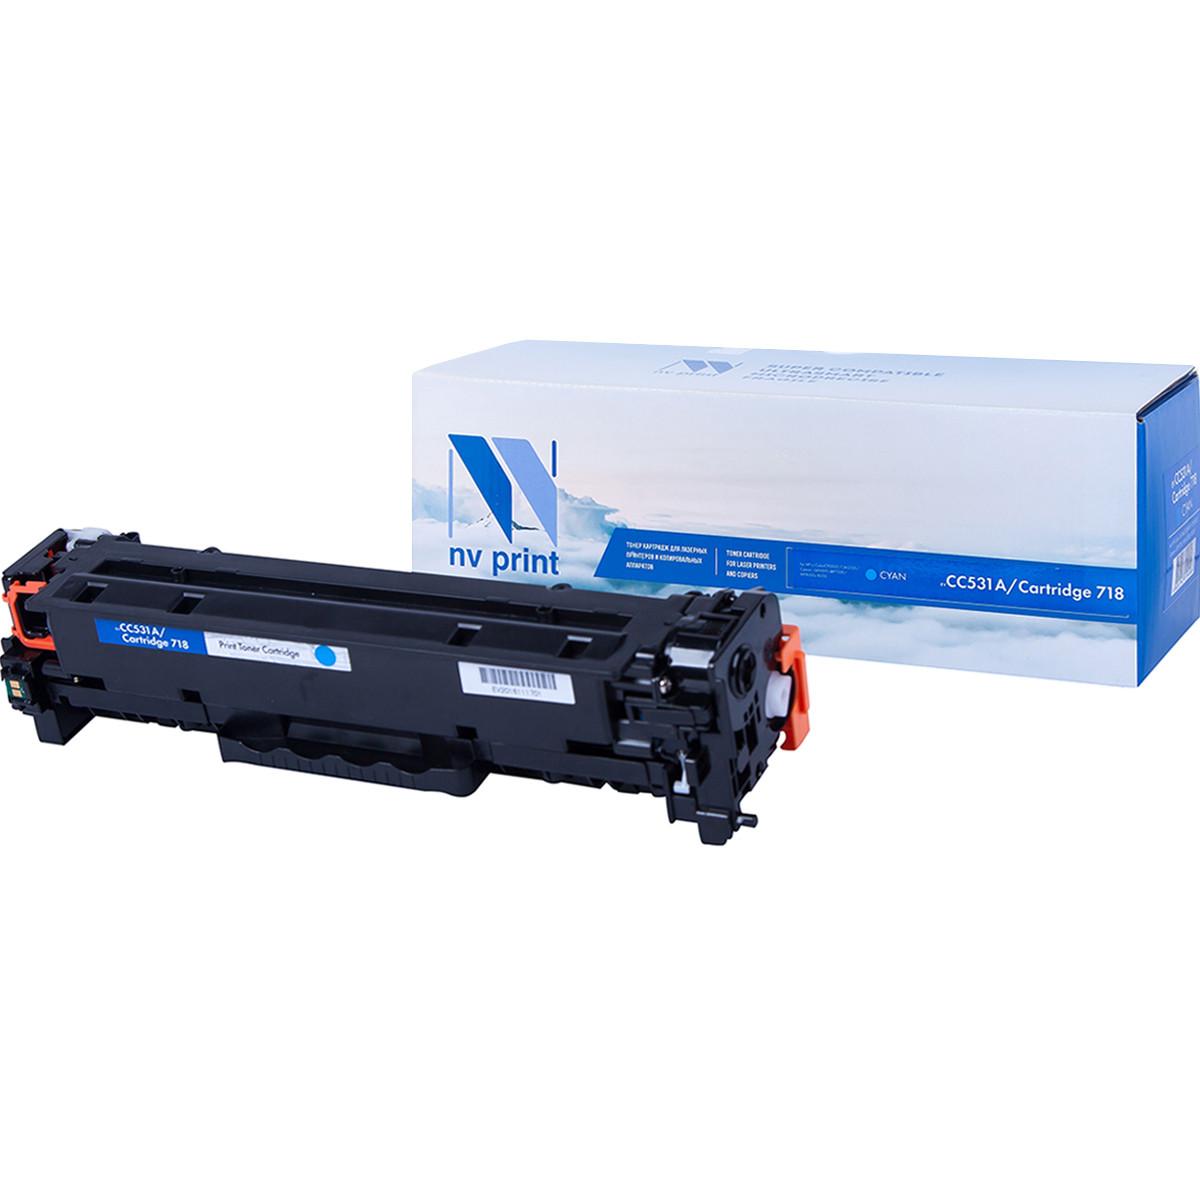 Картридж NVP совместимый HP CC531A/Canon 718 Cyan для LaserJet Color CP2025/CP2025dn/CP2025n/MFP-CM2320fx/CM2320n/Canon MF724Cdw/MF728Cdw i-SENSYS